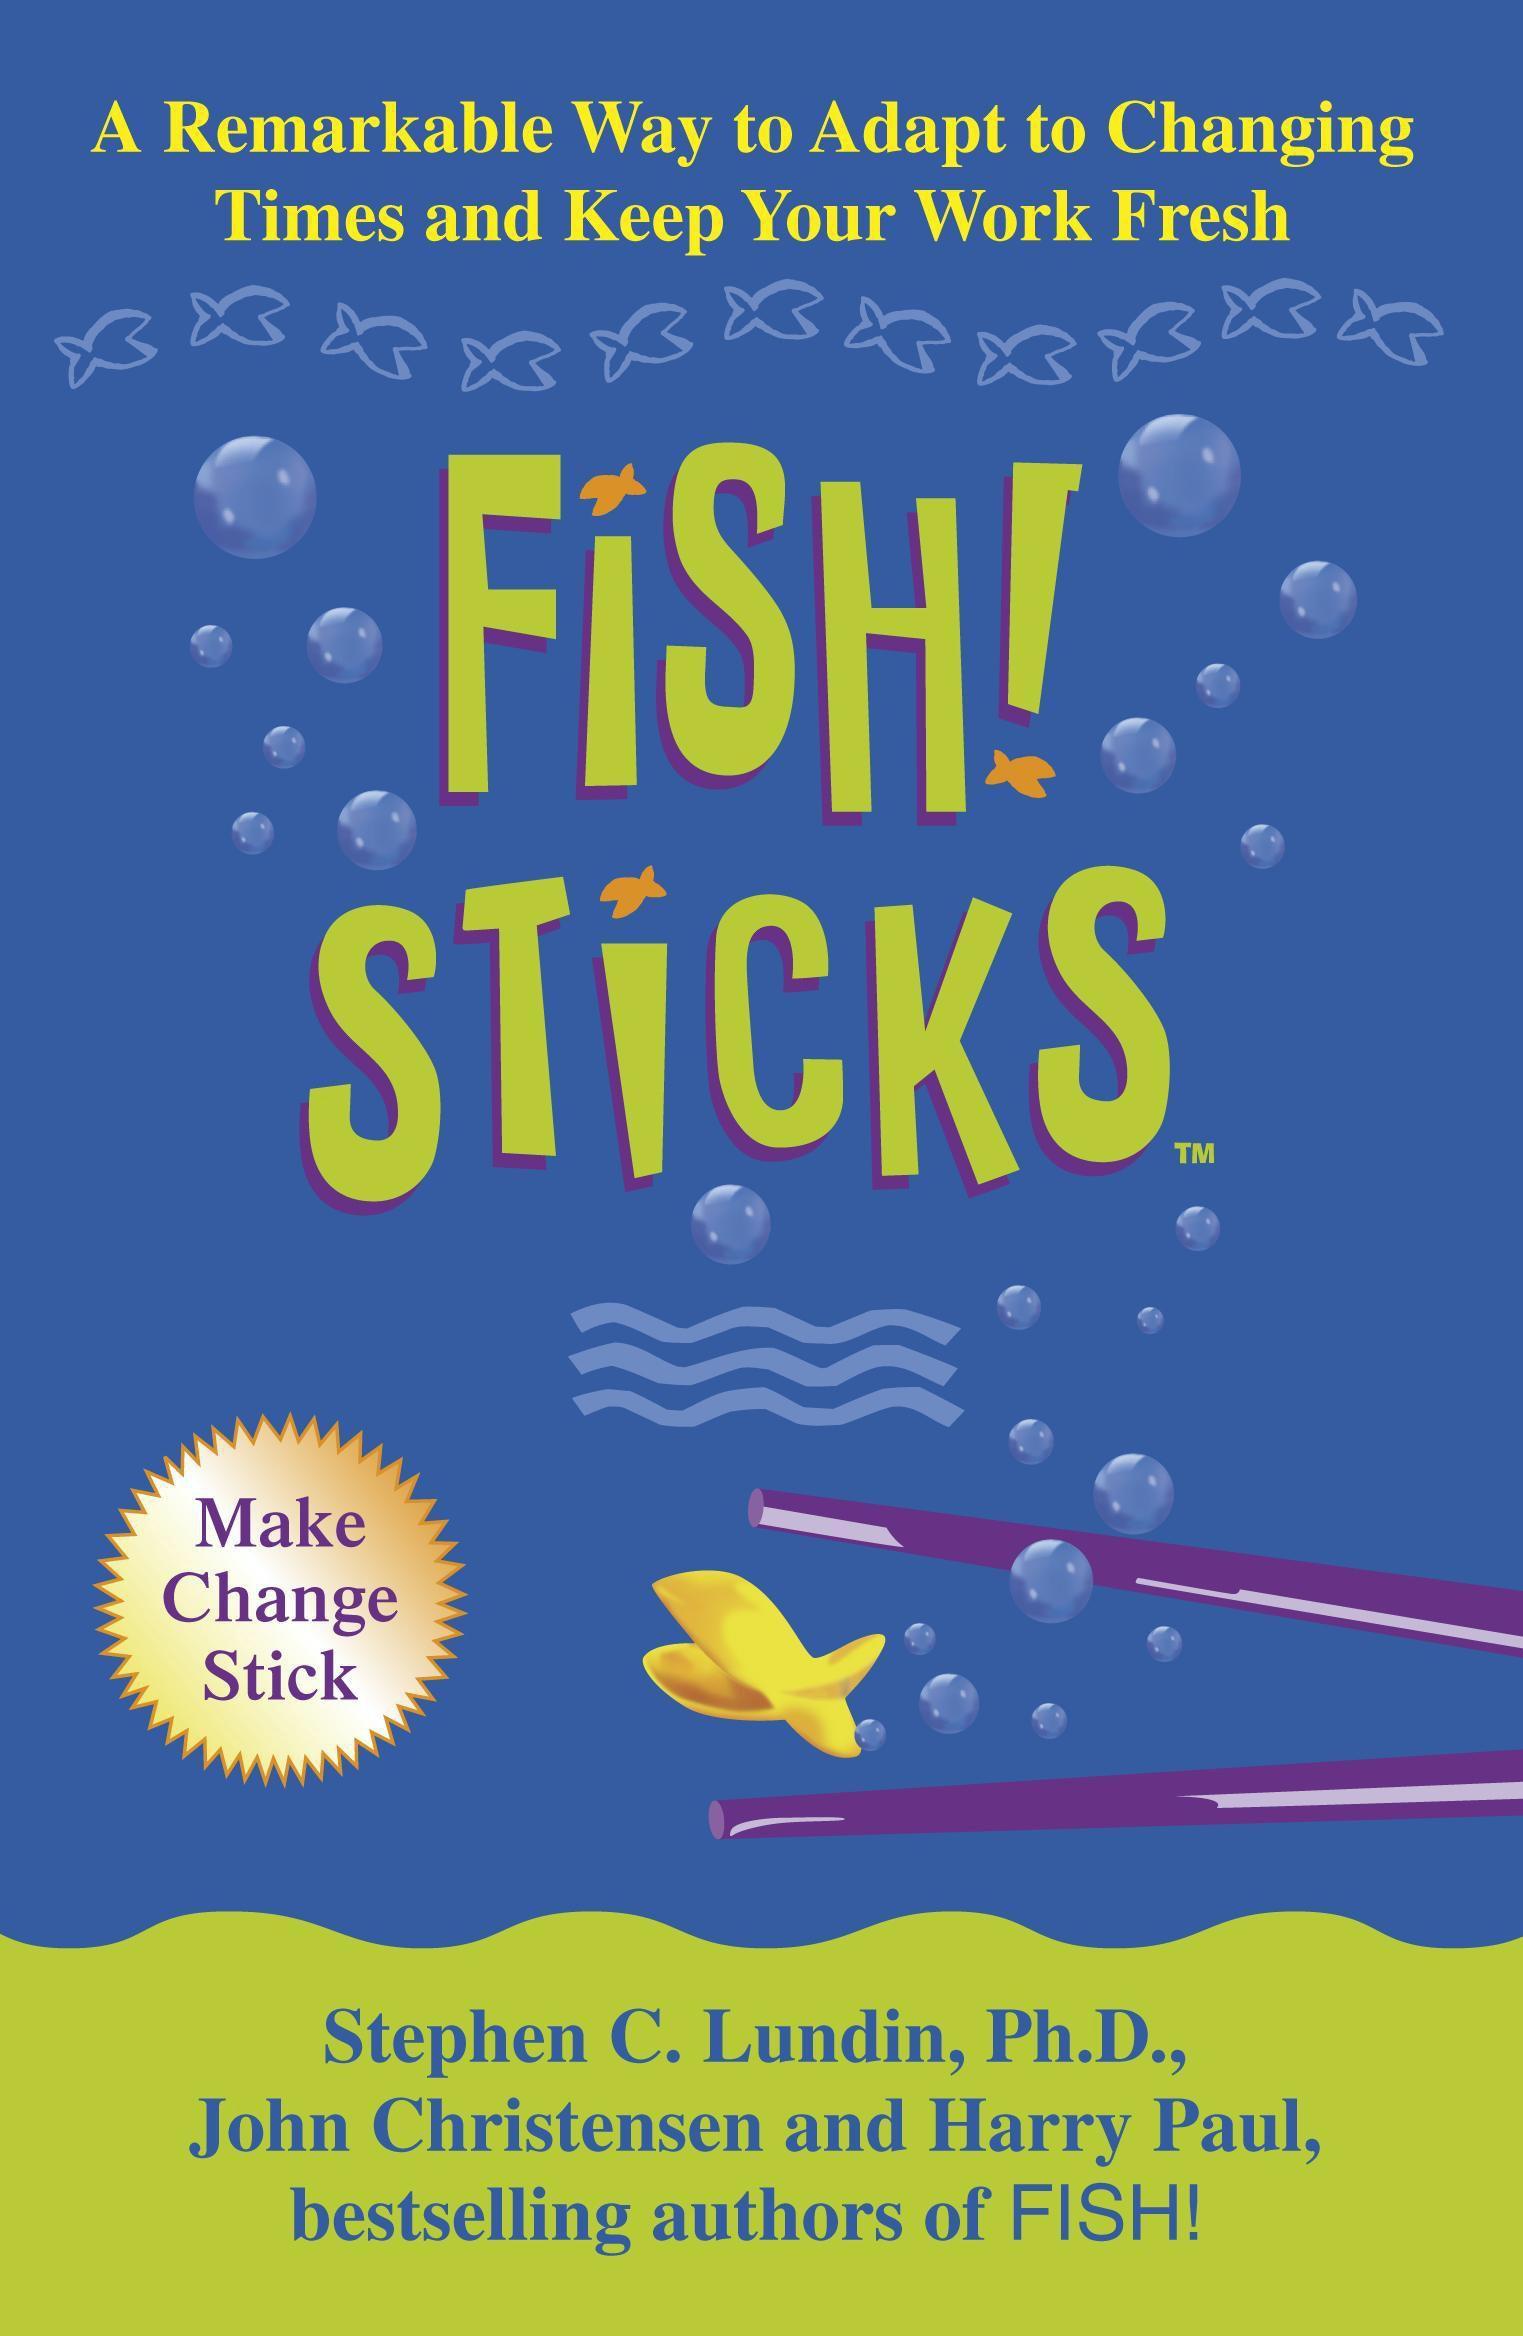 Fish Stephen C Lundin Ebook